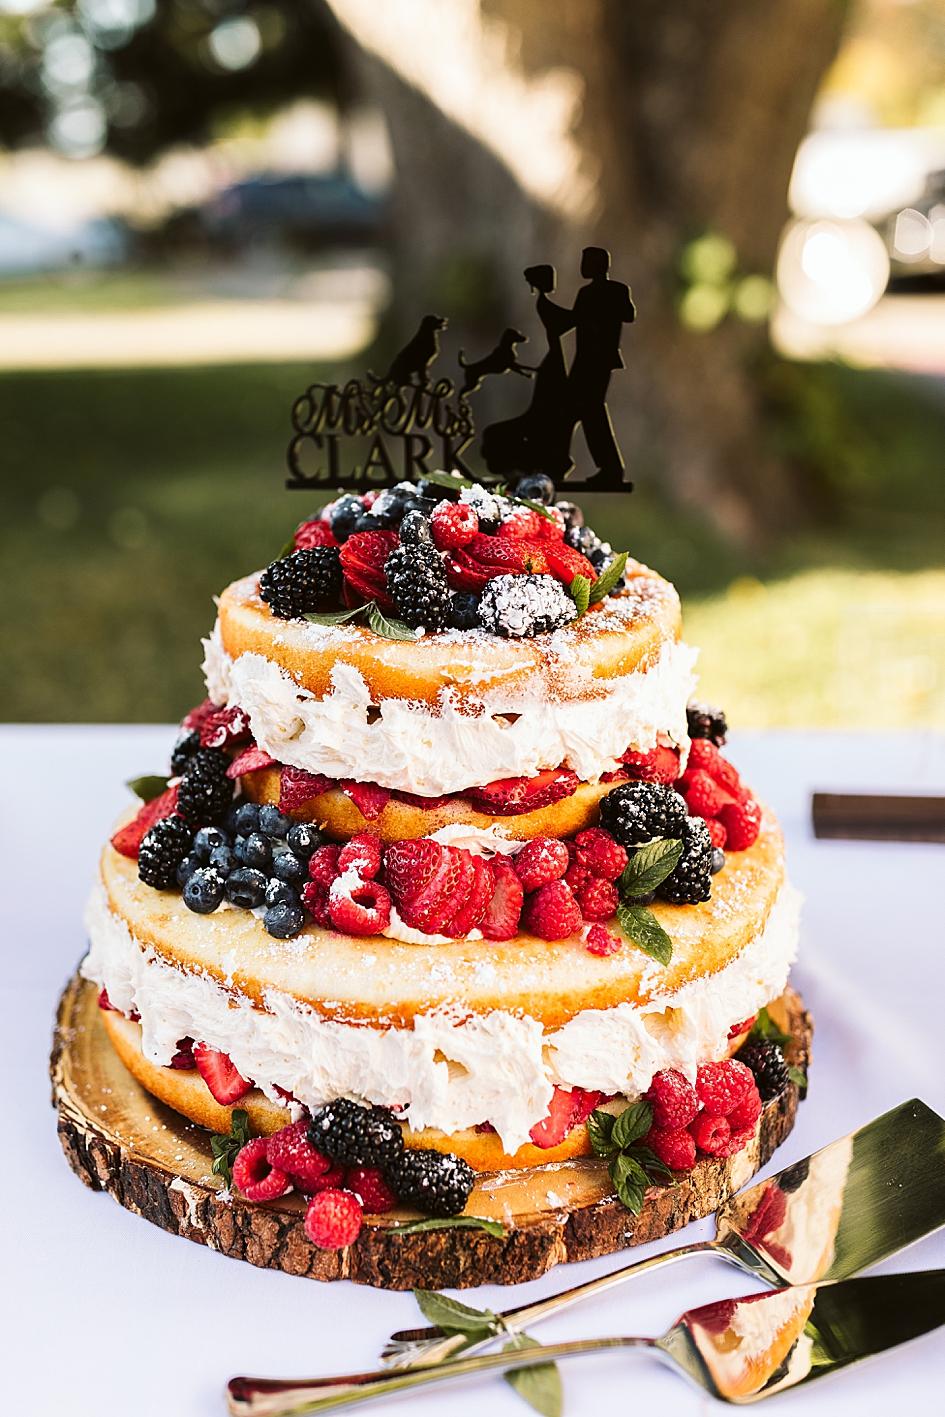 seattle bride, seattle wedding, seattle wedding photographer, seattle wedding inspiration, wedding inspiration